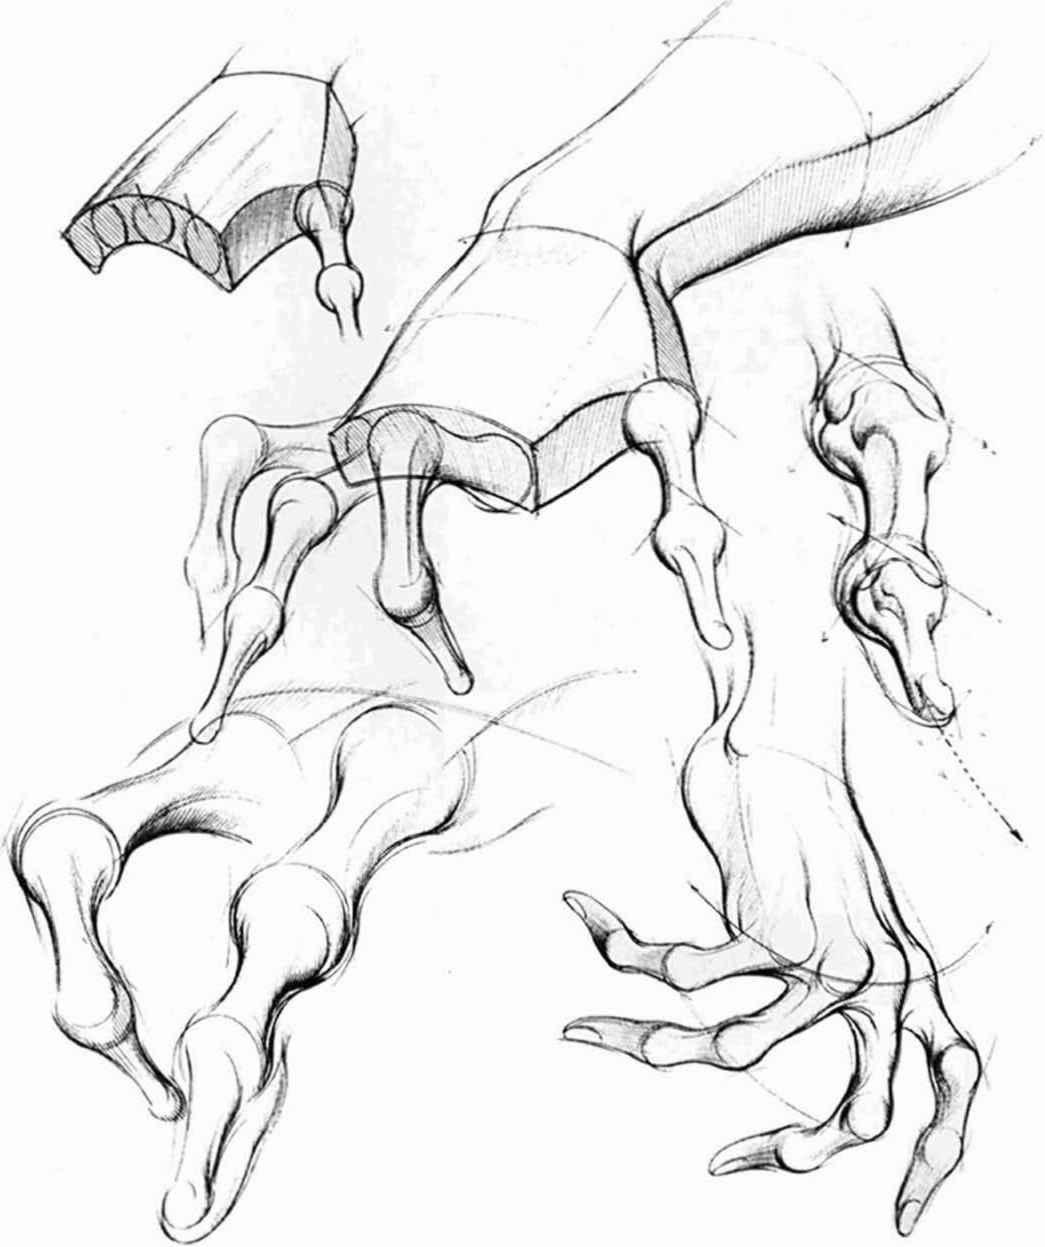 Drawn fist hand movement Forms Joshua Drawing Curves Nava